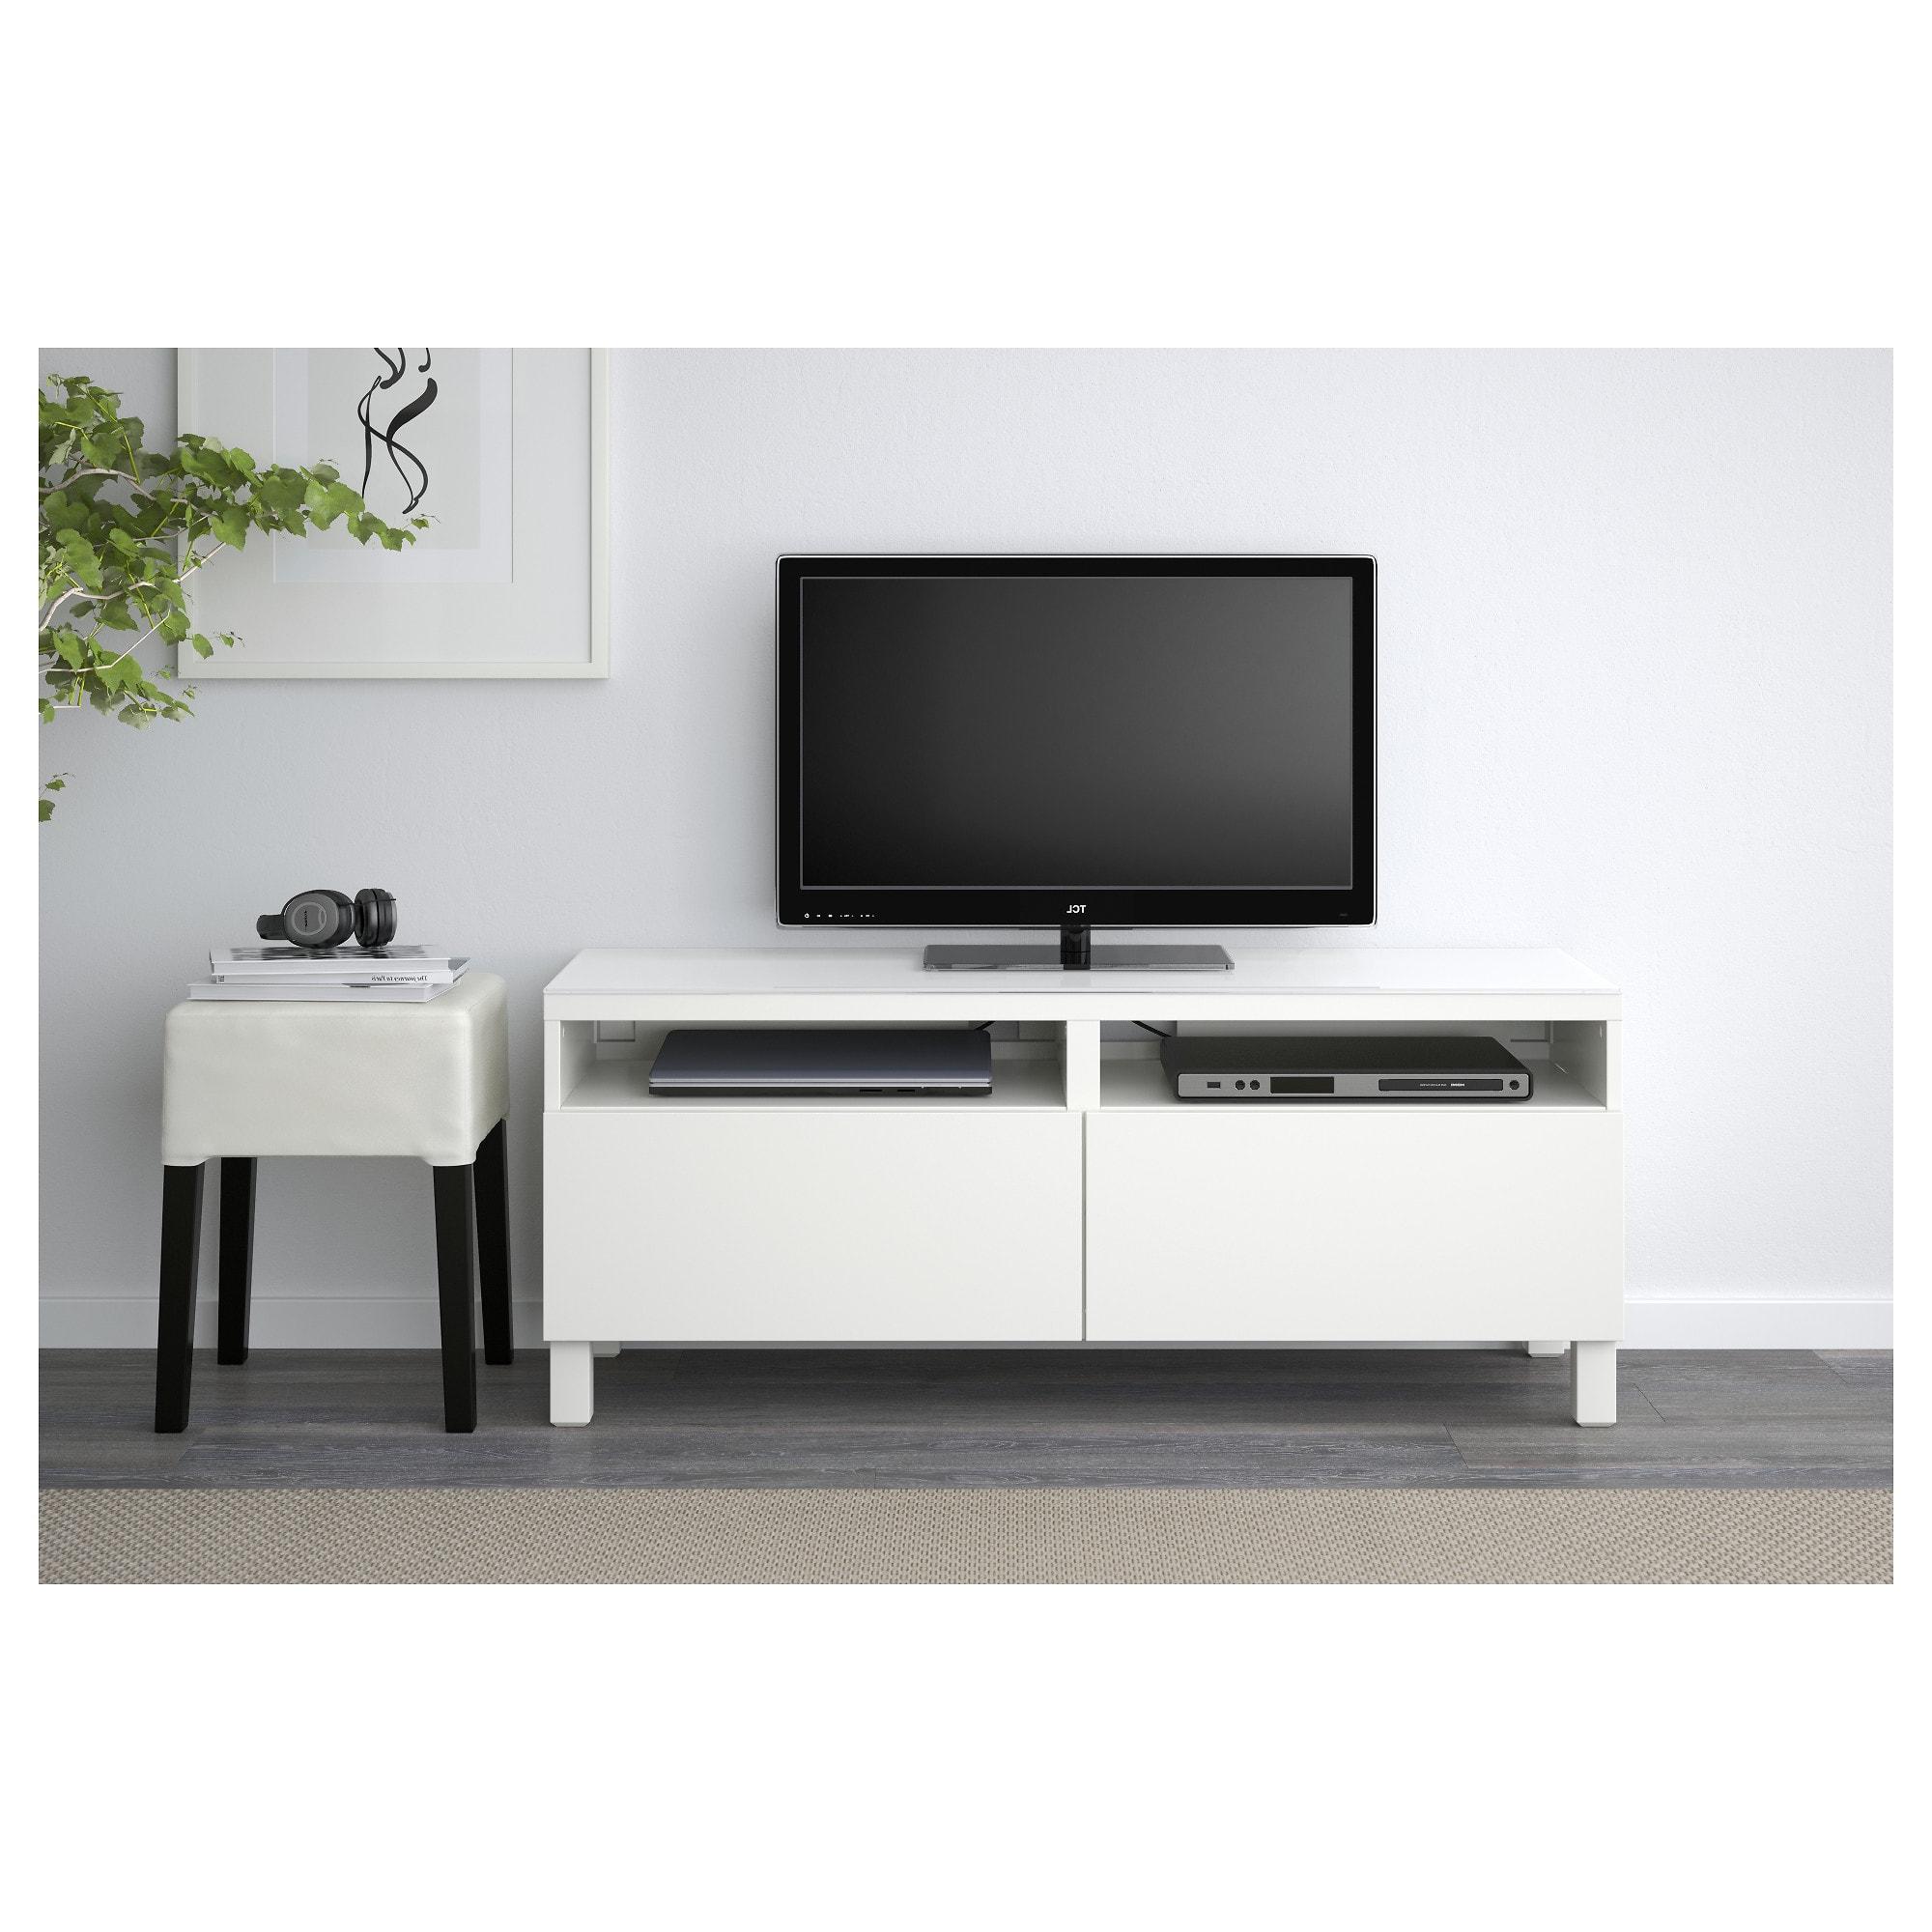 Besta Mueble Tv S1du Bestà Mueble Tv Con Almacenaje Lappviken Blanco 120 X 40 X 48 Cm Ikea